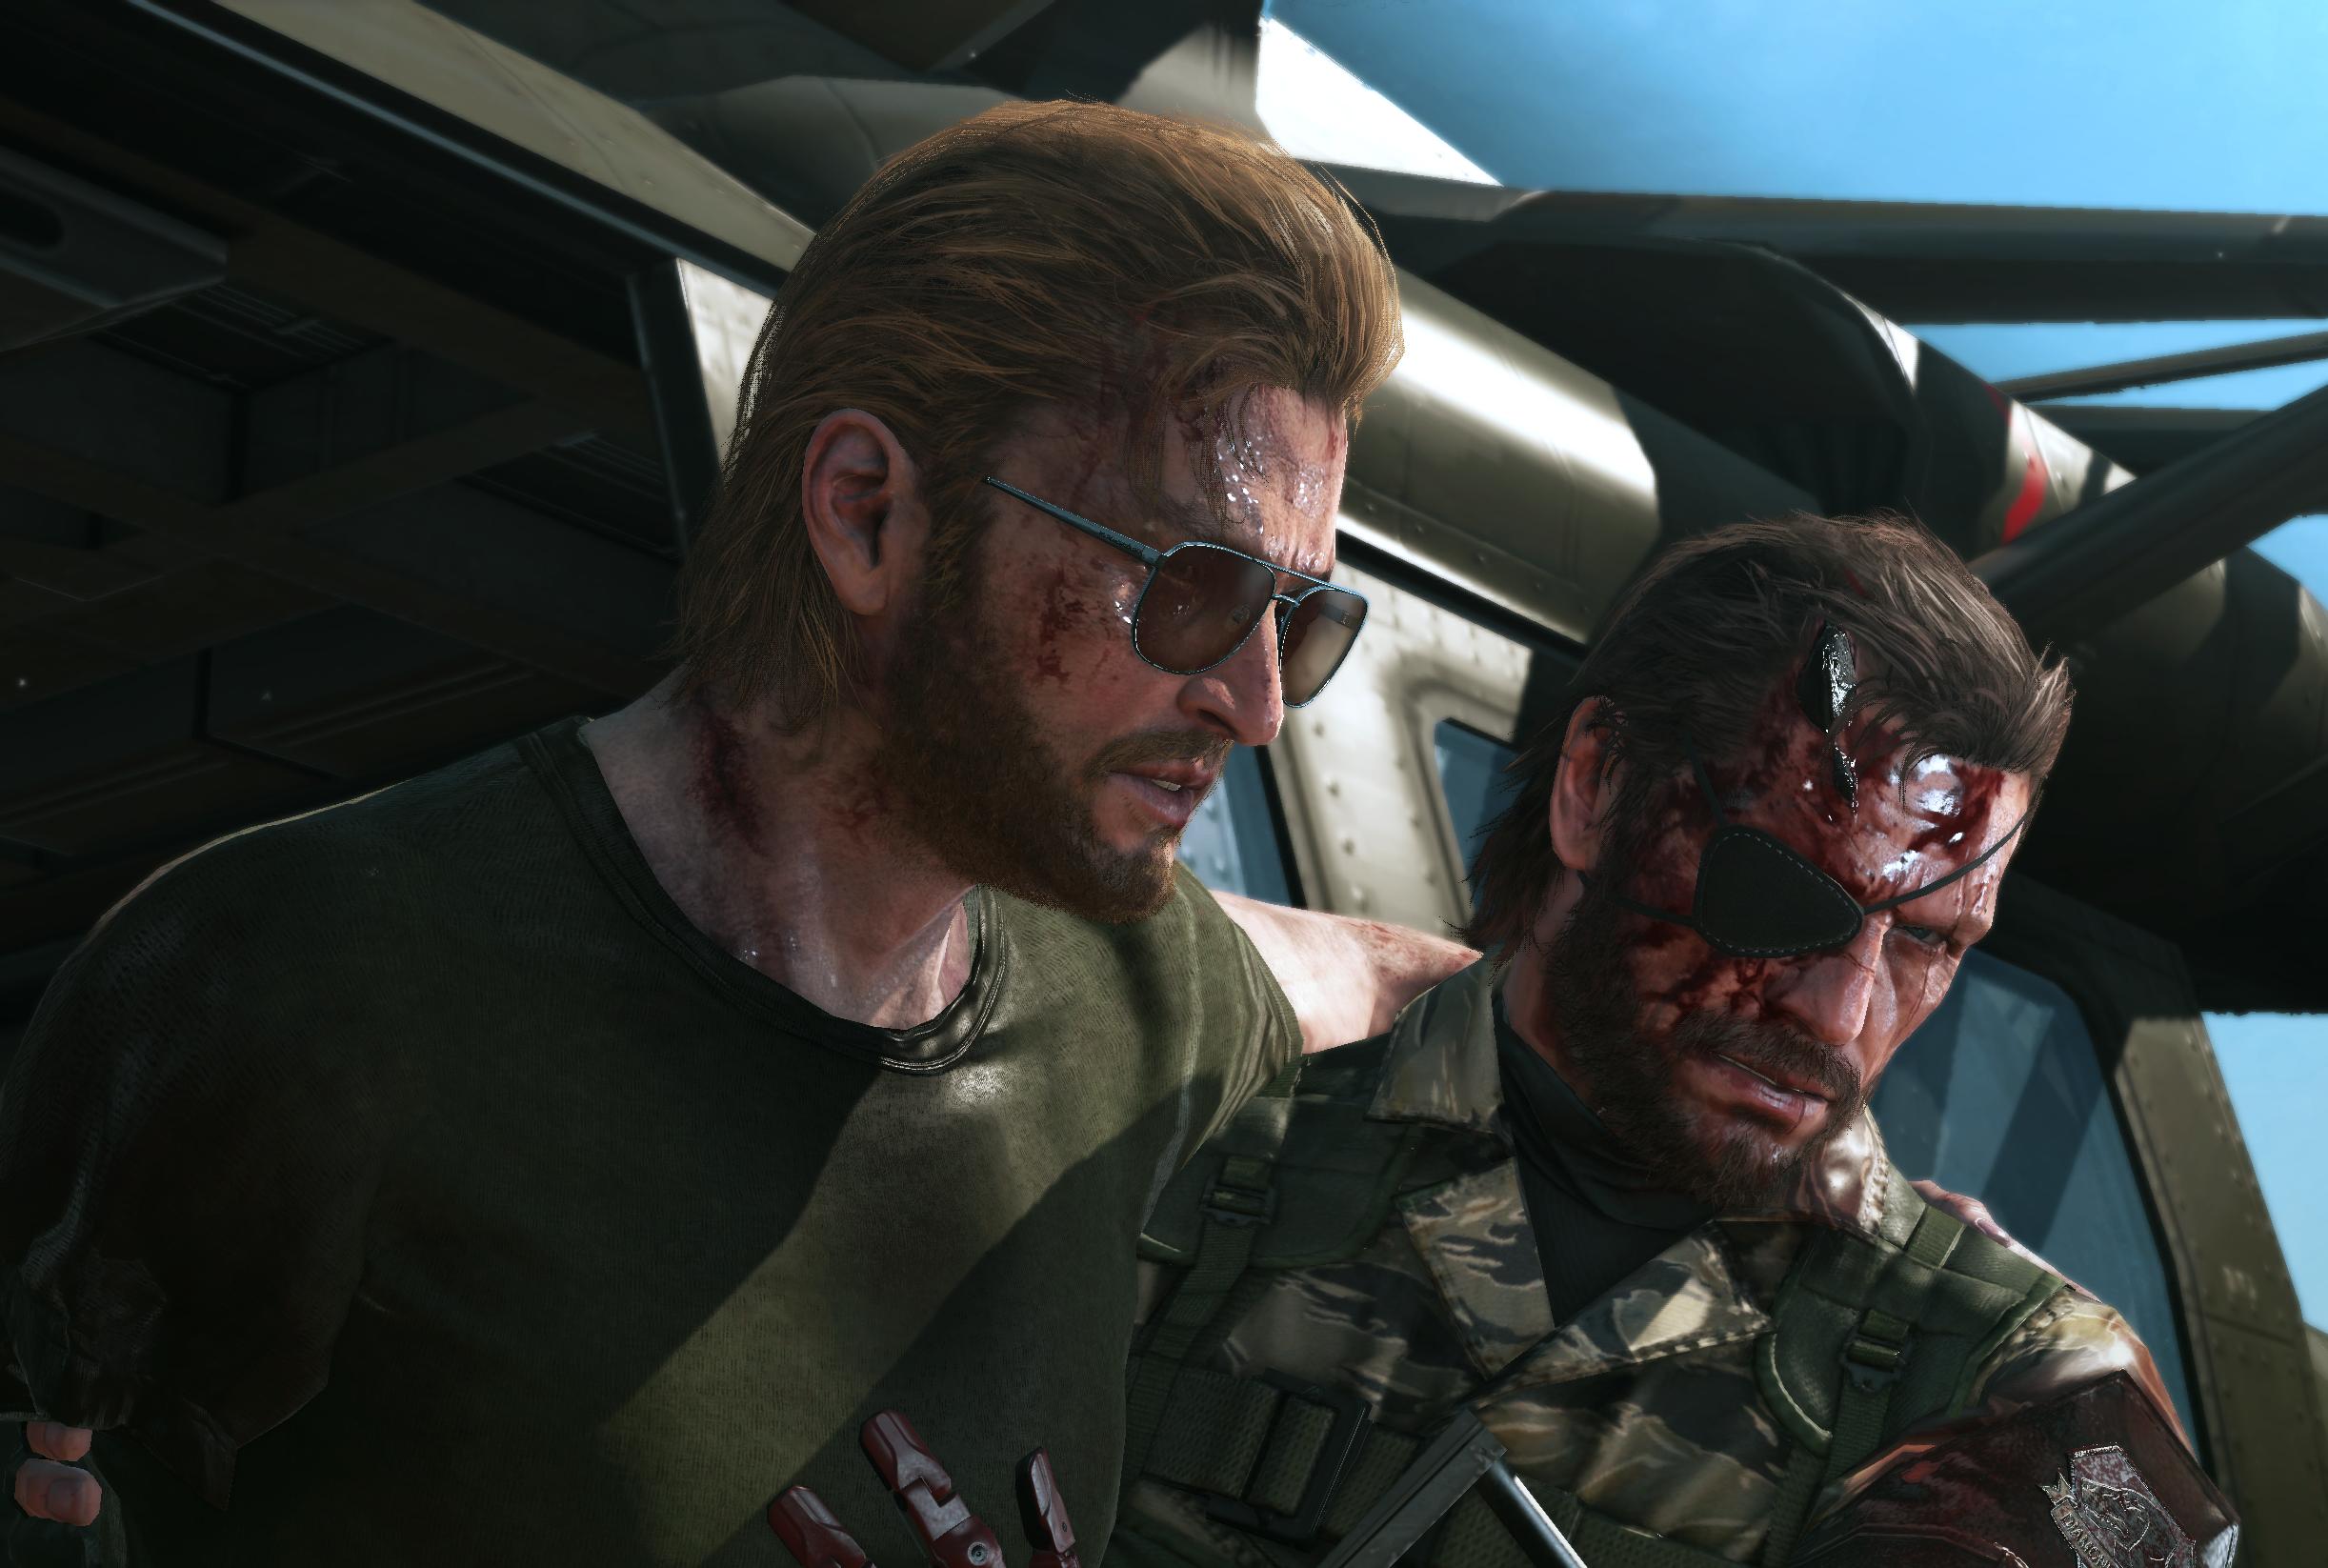 Metal Gear Solid V  The Phantom Pain Screenshot 2021.04.17 - 19.40.58.52 (2).png - Metal Gear Solid 5: The Phantom Pain